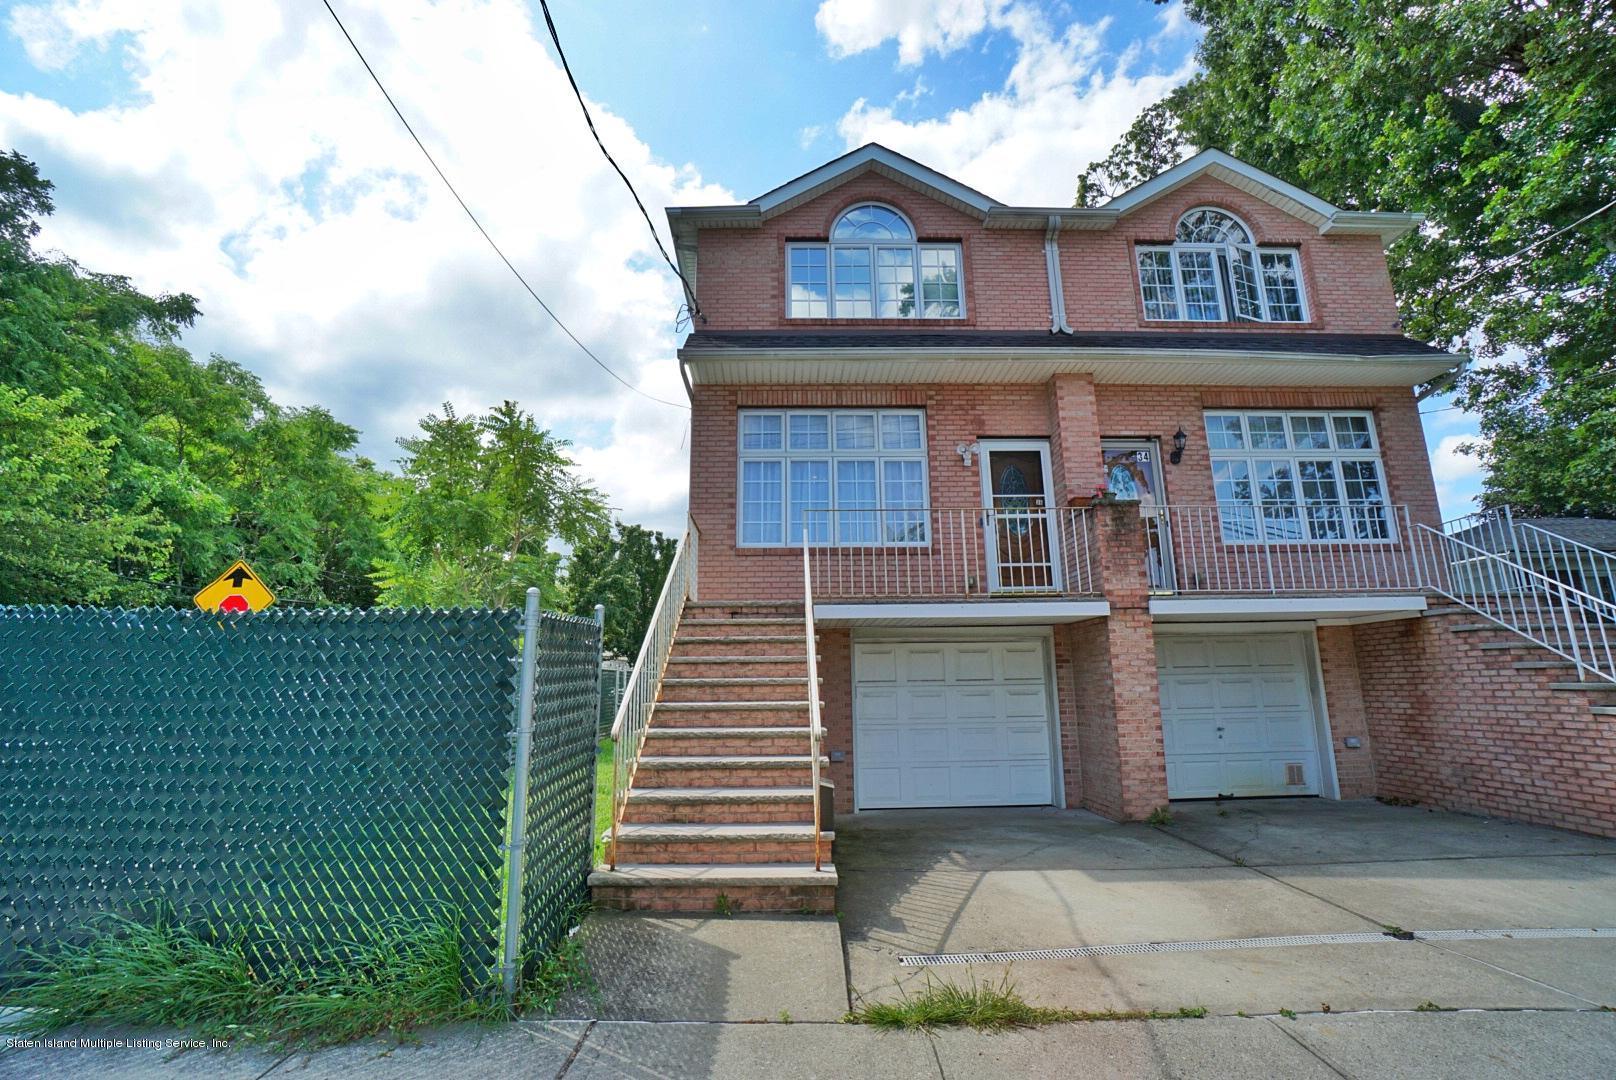 Single Family - Semi-Attached 36 Zwicky Avenue  Staten Island, NY 10306, MLS-1131911-2